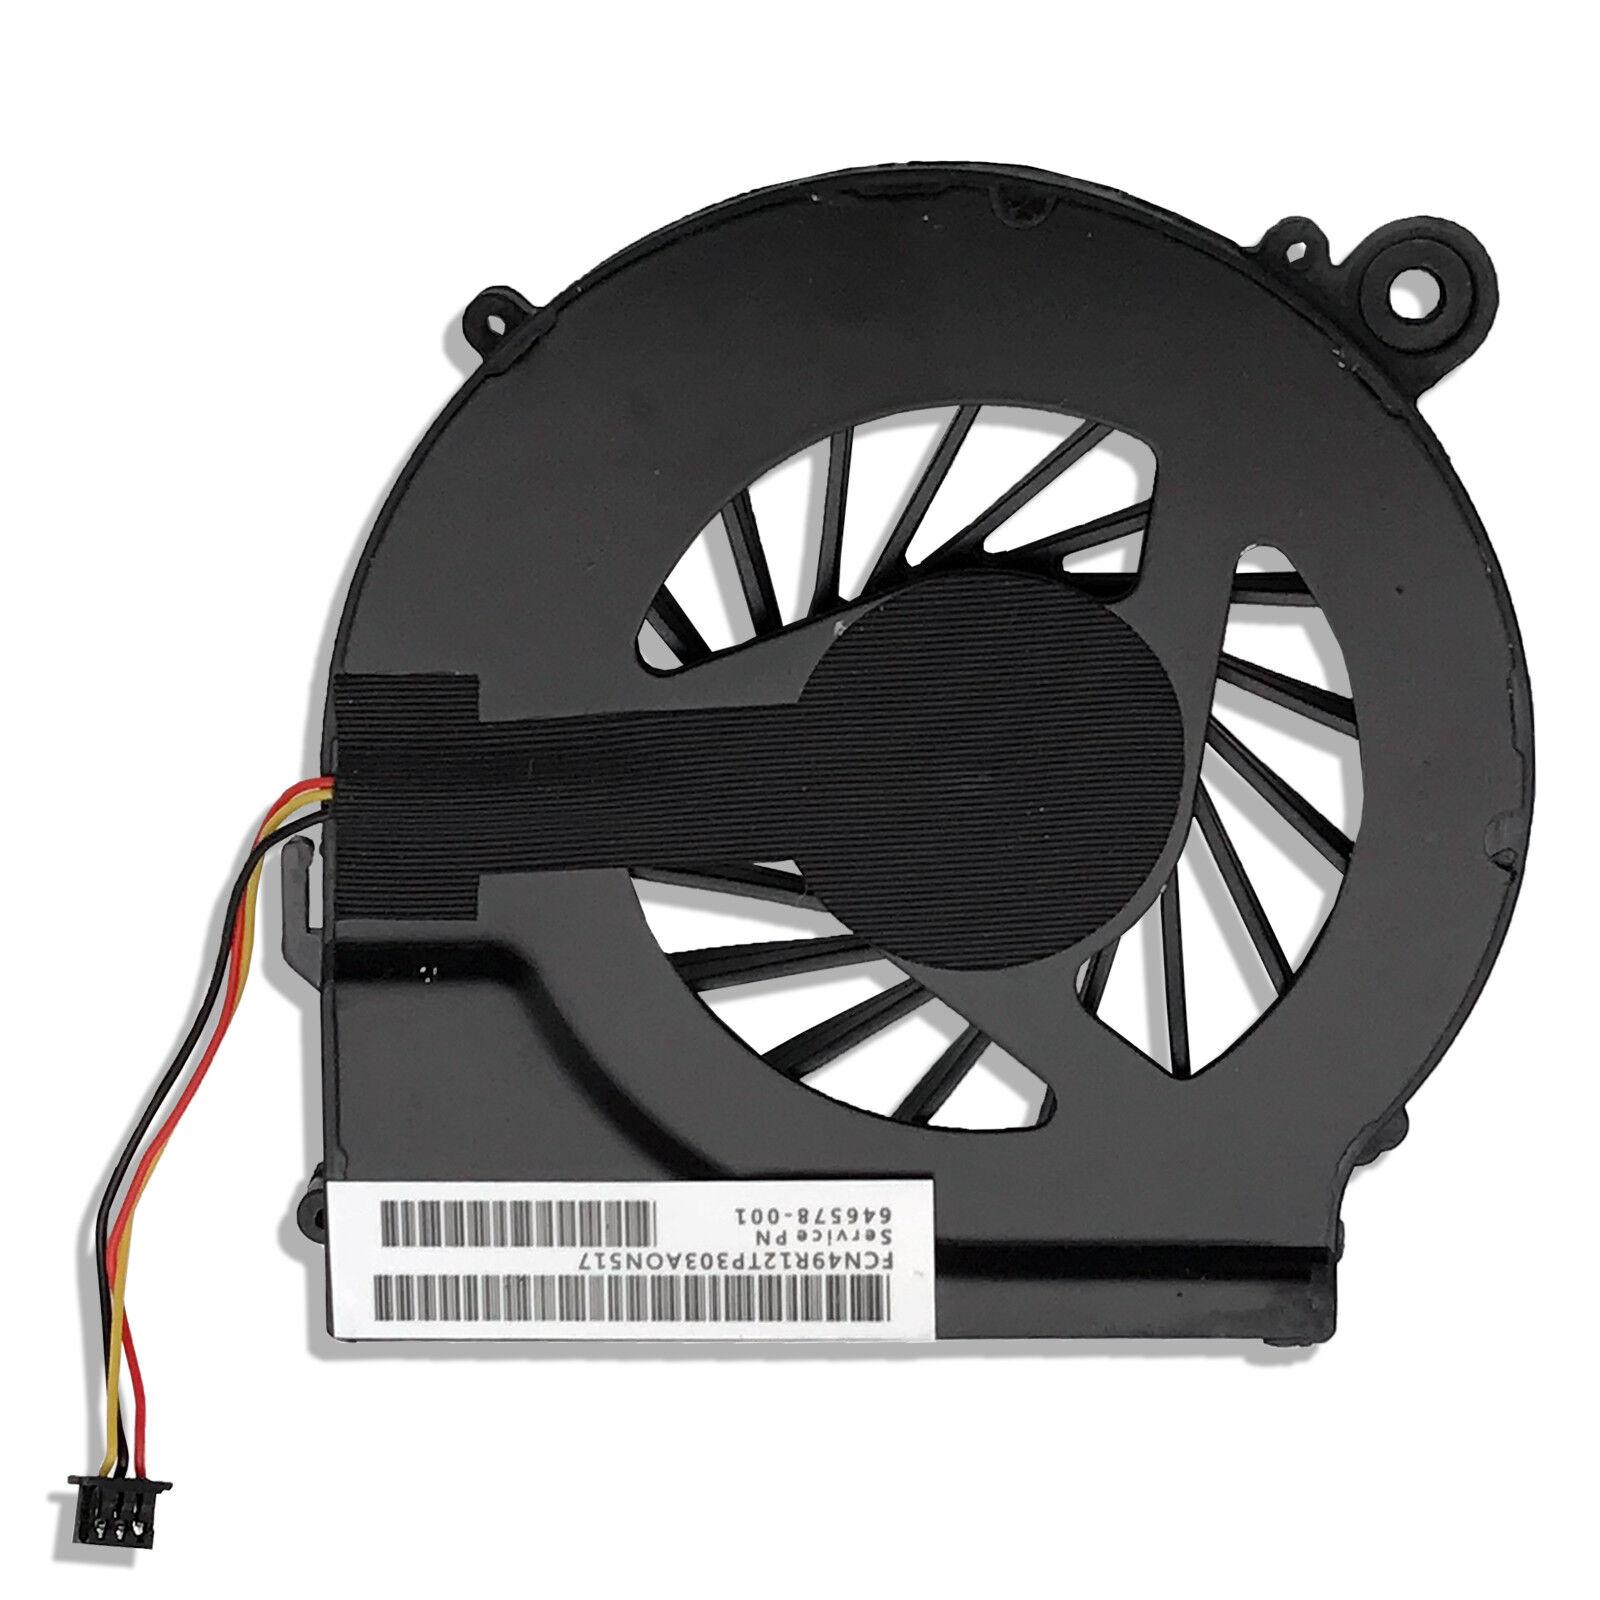 New For HP Compaq CQ56 CQ56-112 CQ56-115 AMD CPU Cooling Fan 643364-001